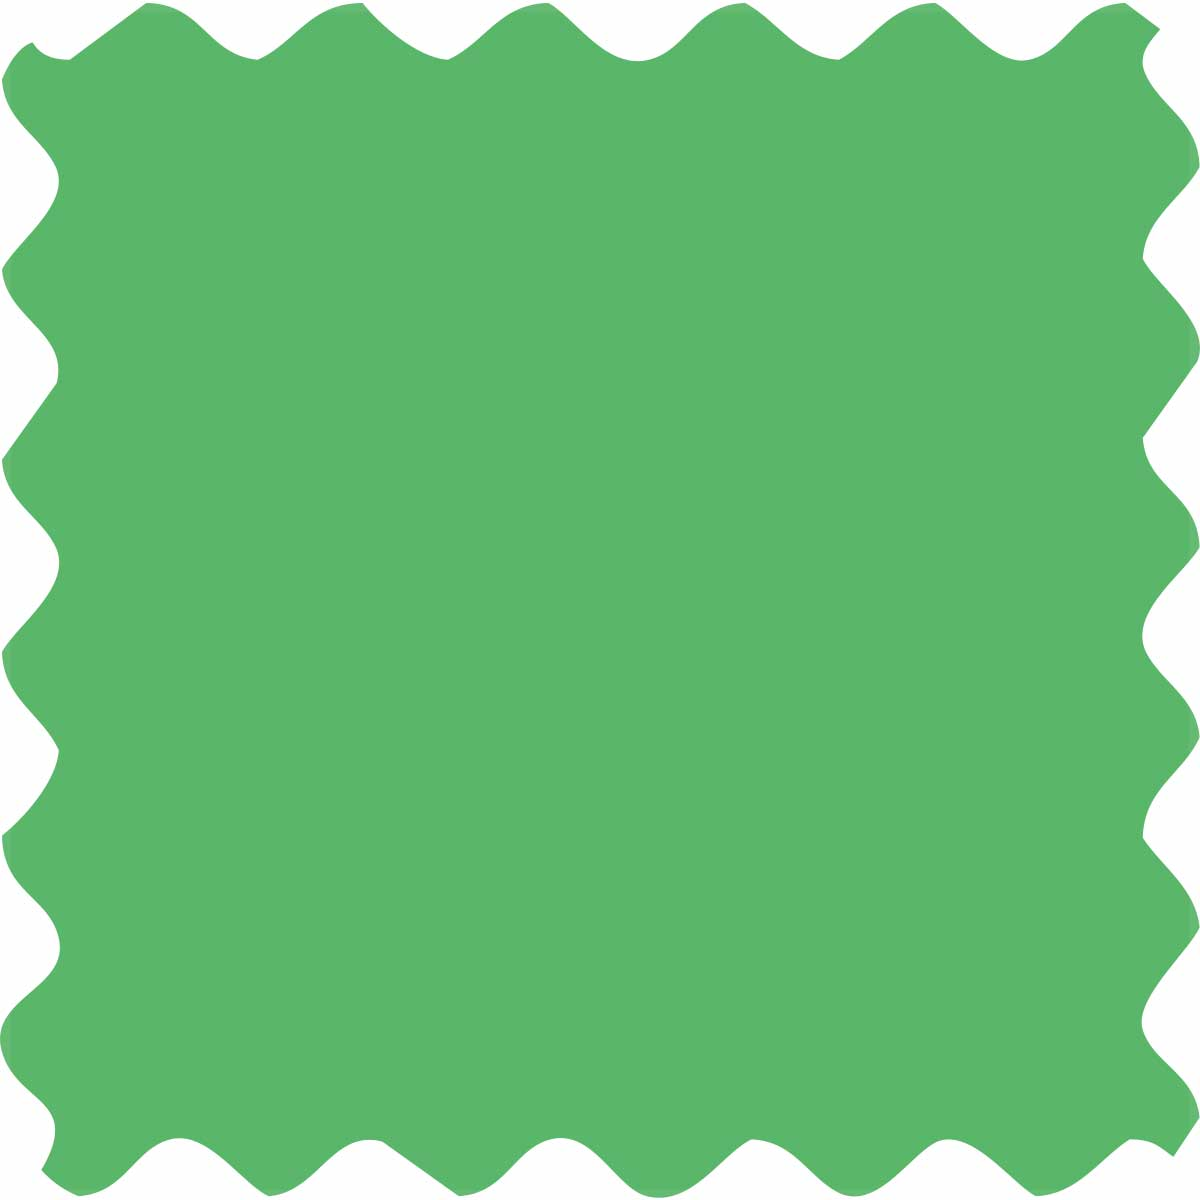 Fabric Creations™ Plush™ 3-D Fabric Paints - Watermelon Rind, 2 oz.